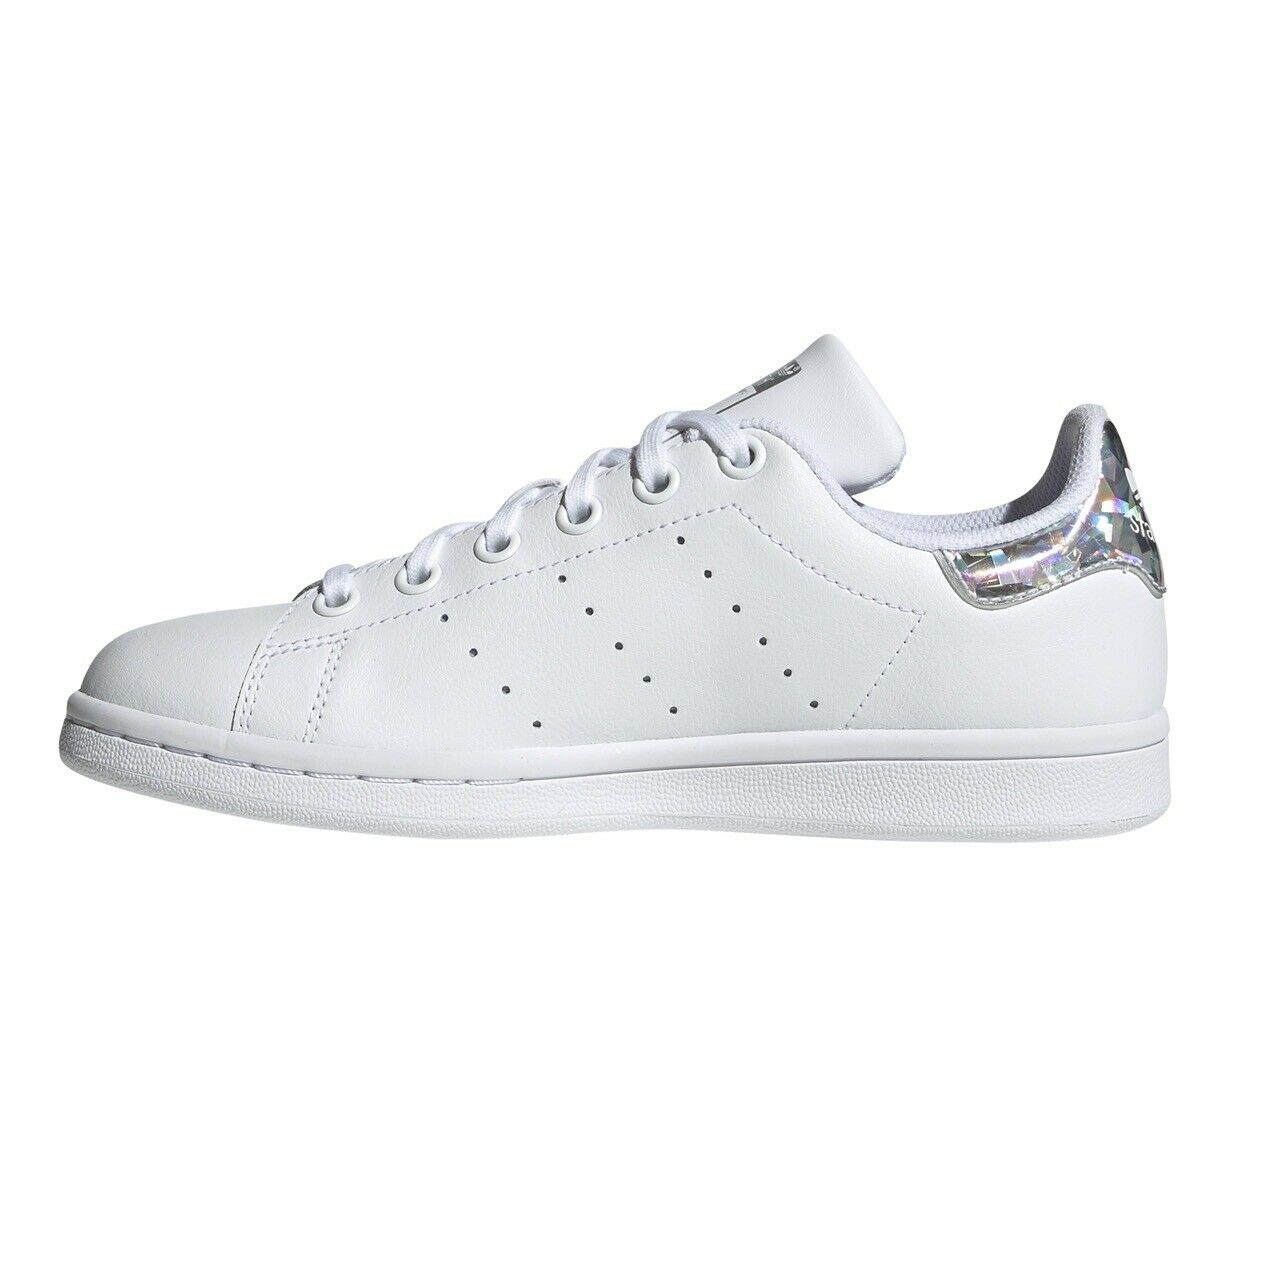 schuhe damen Adidas Stan Smith Originals Turnschuhe Ragazza Bianco Silber Silber